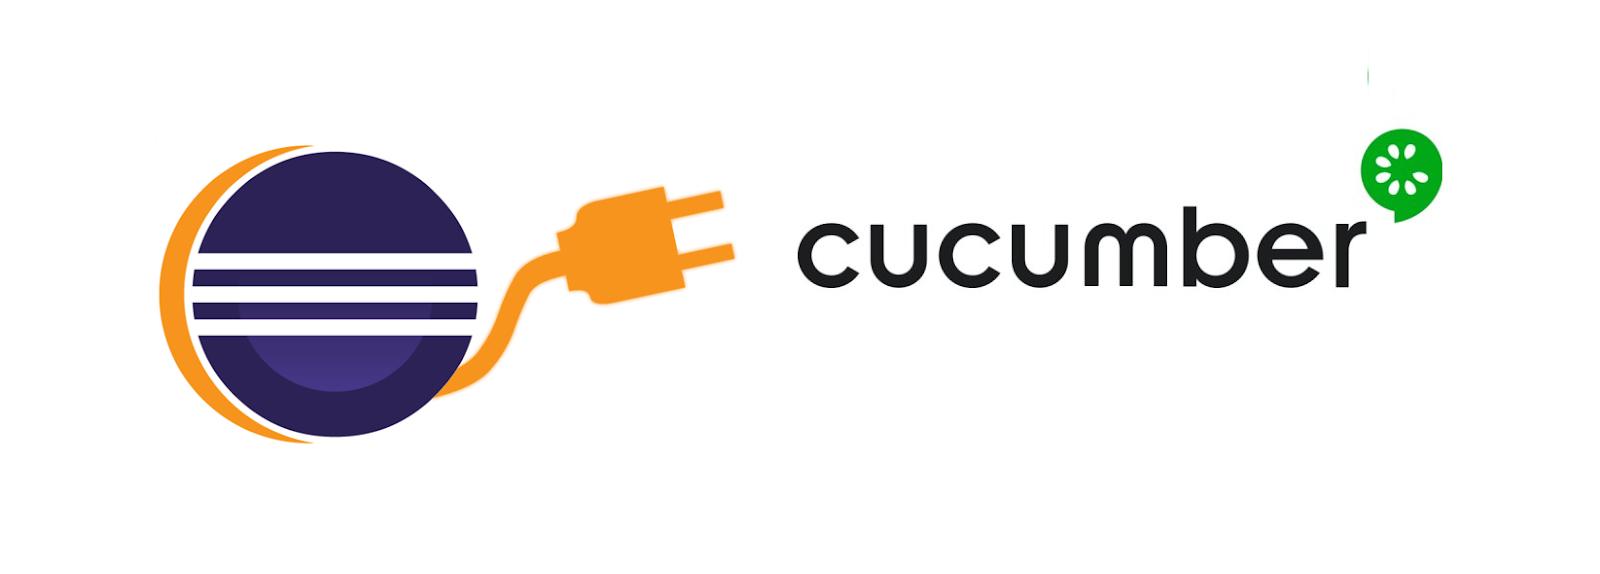 How to install Cucumber Eclipse Plugin